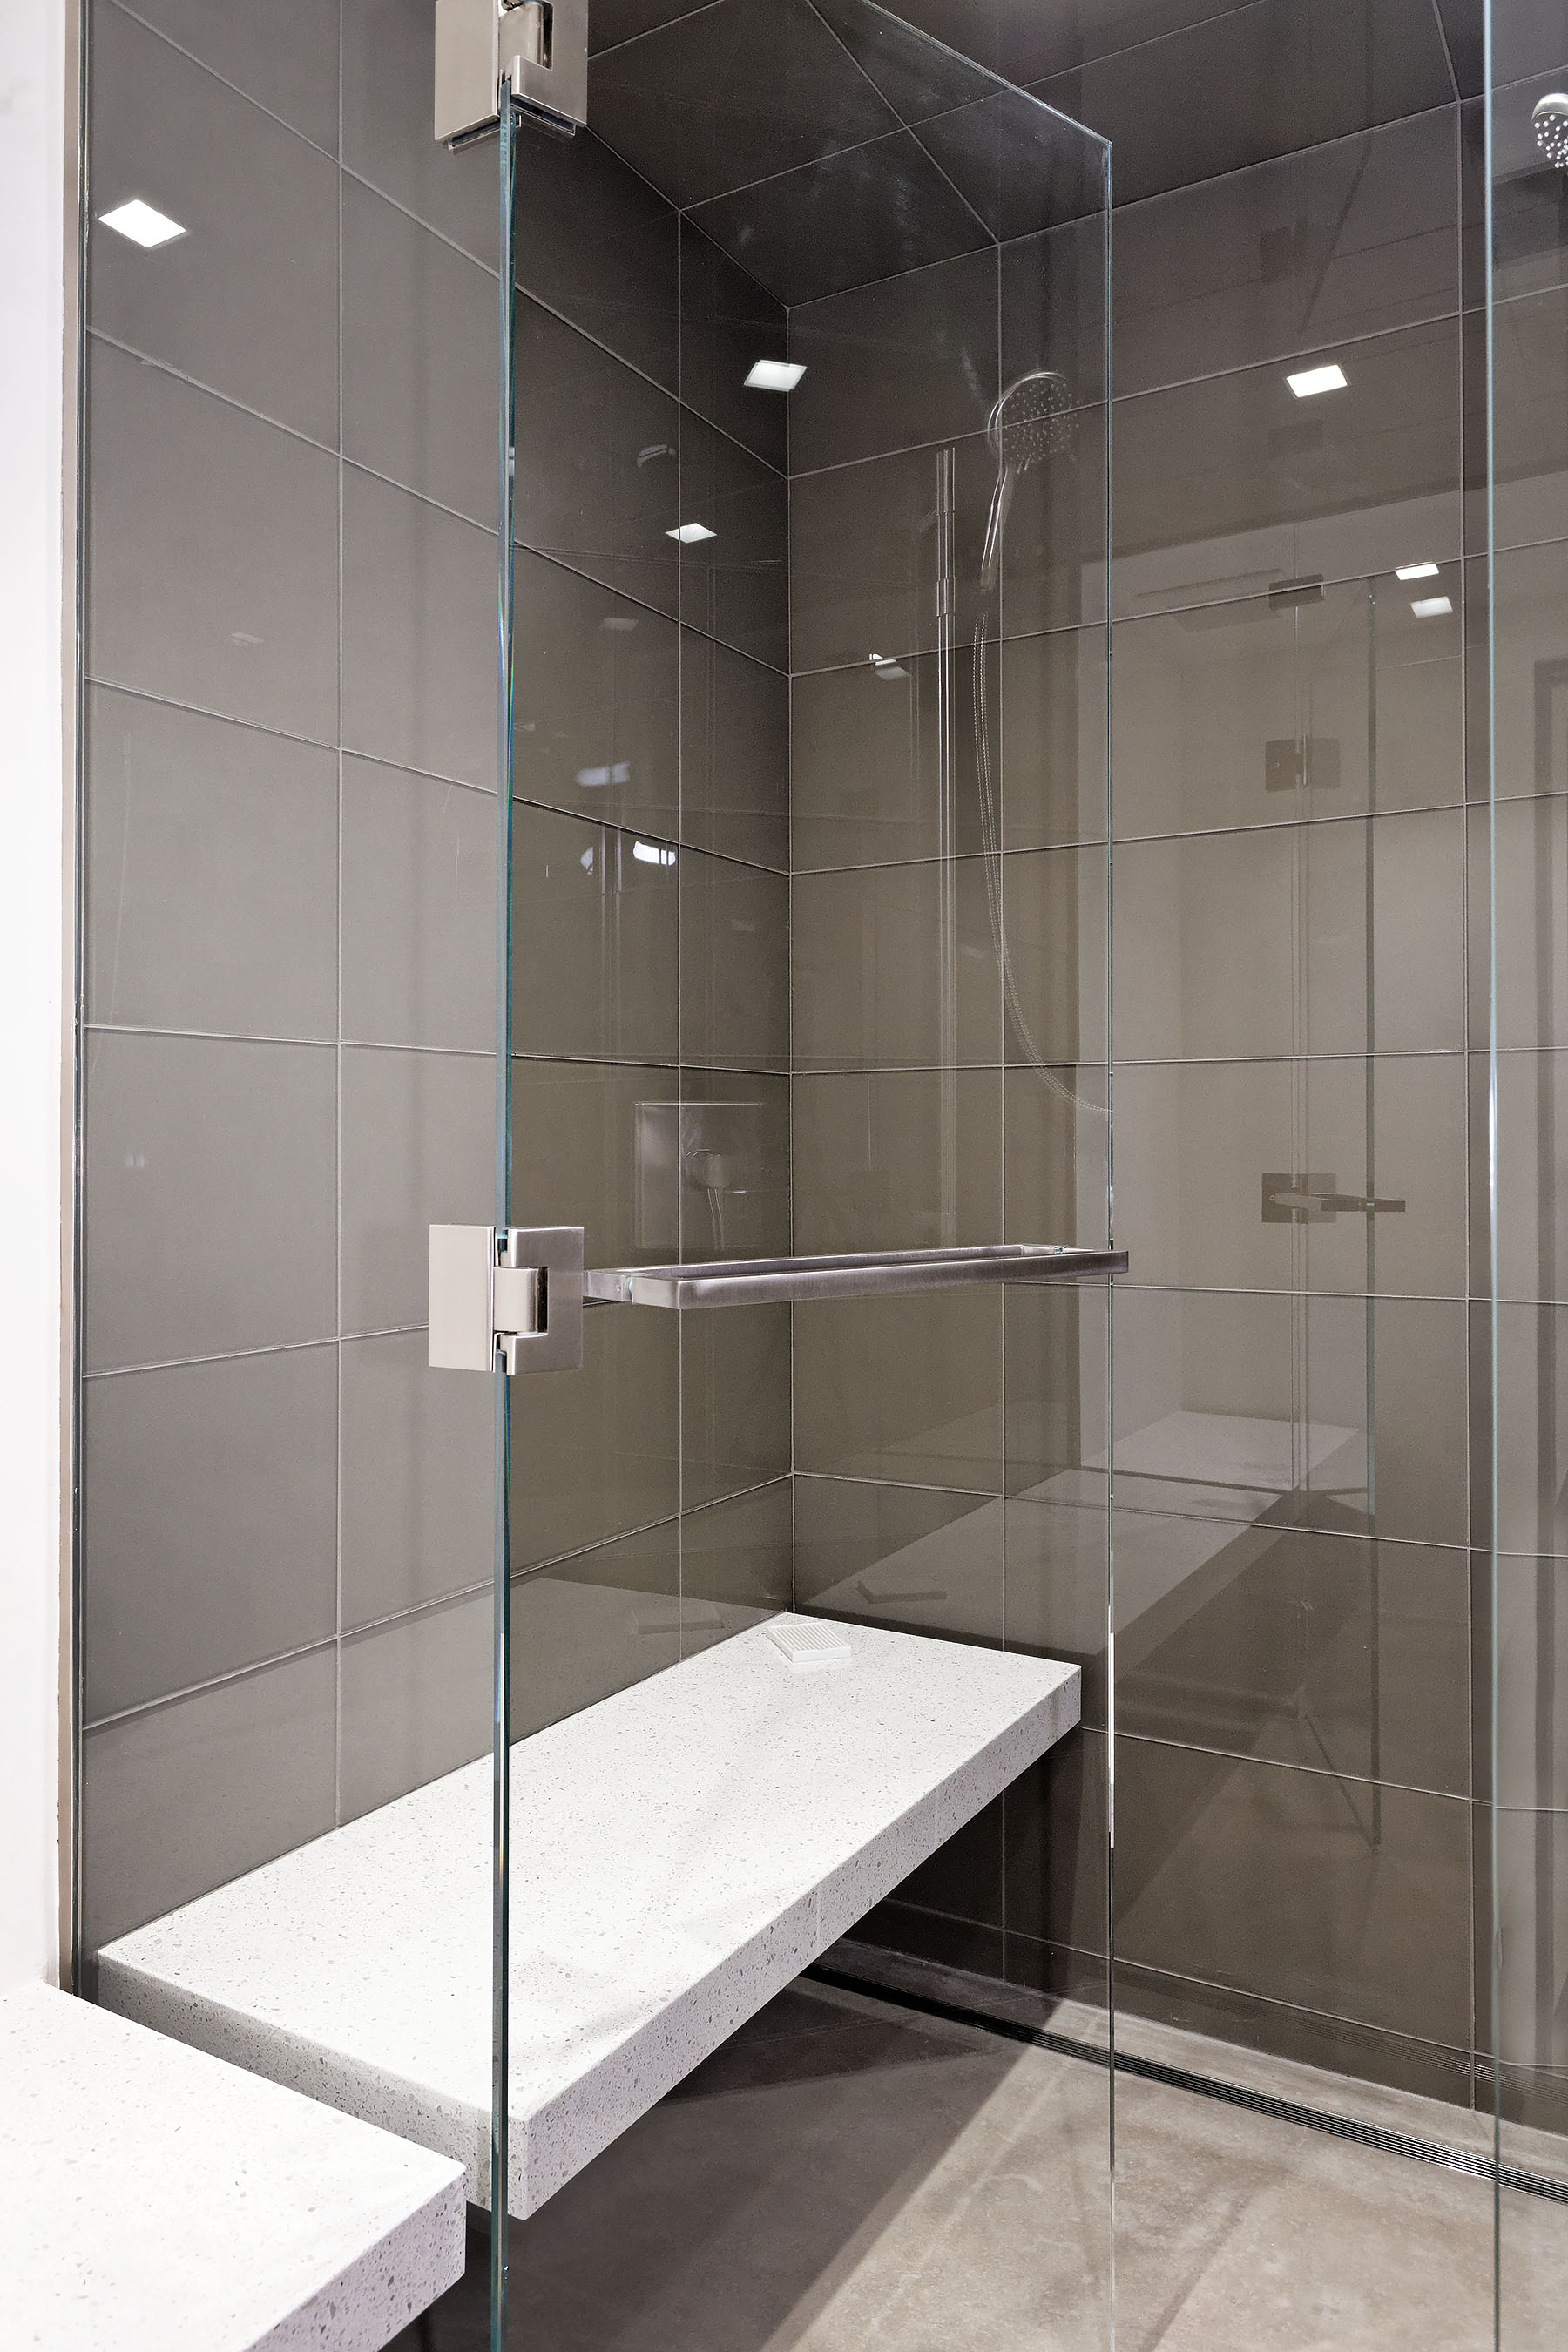 Media room bath